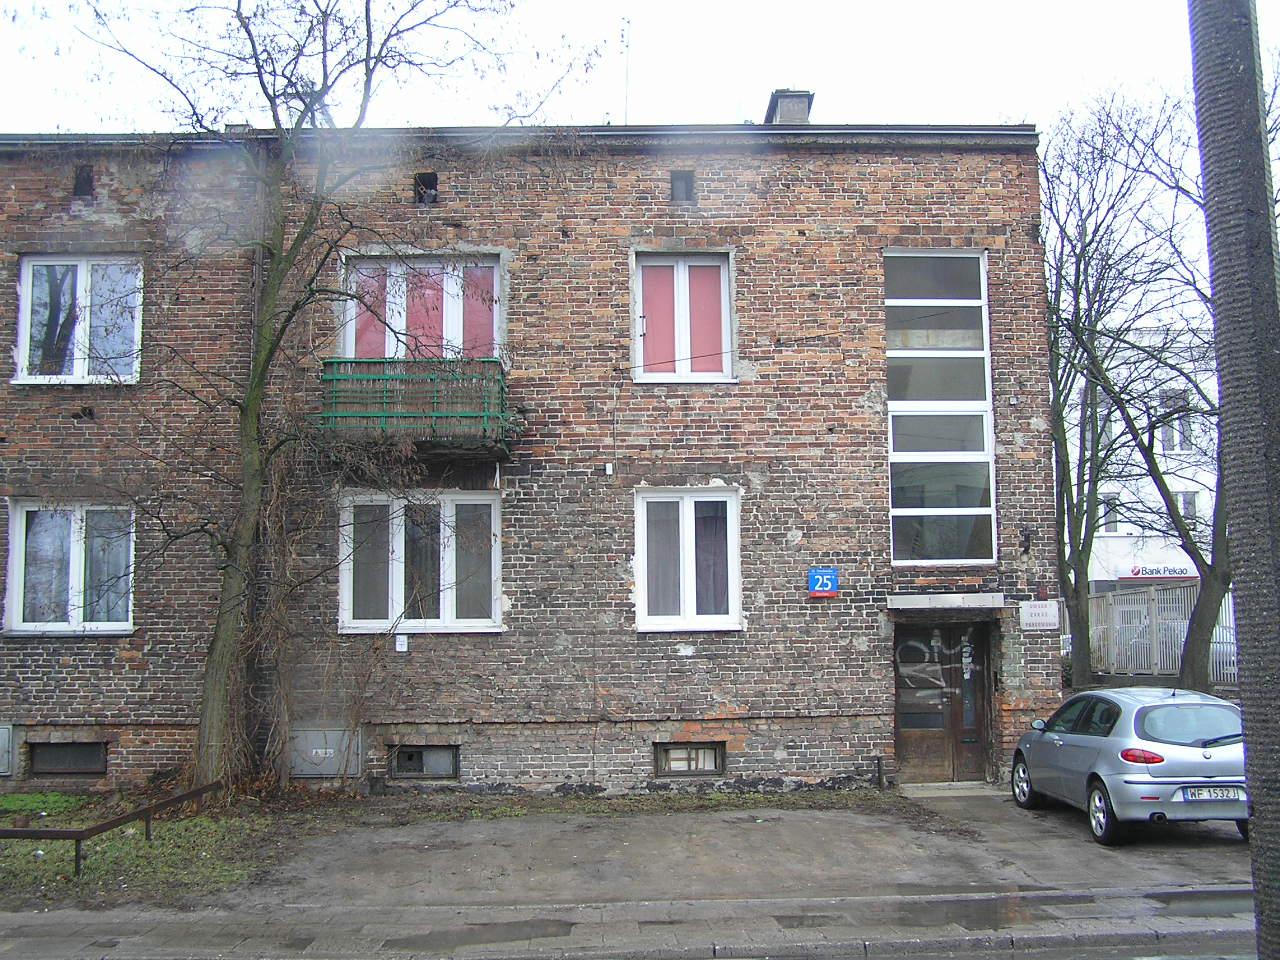 Omulewska 25